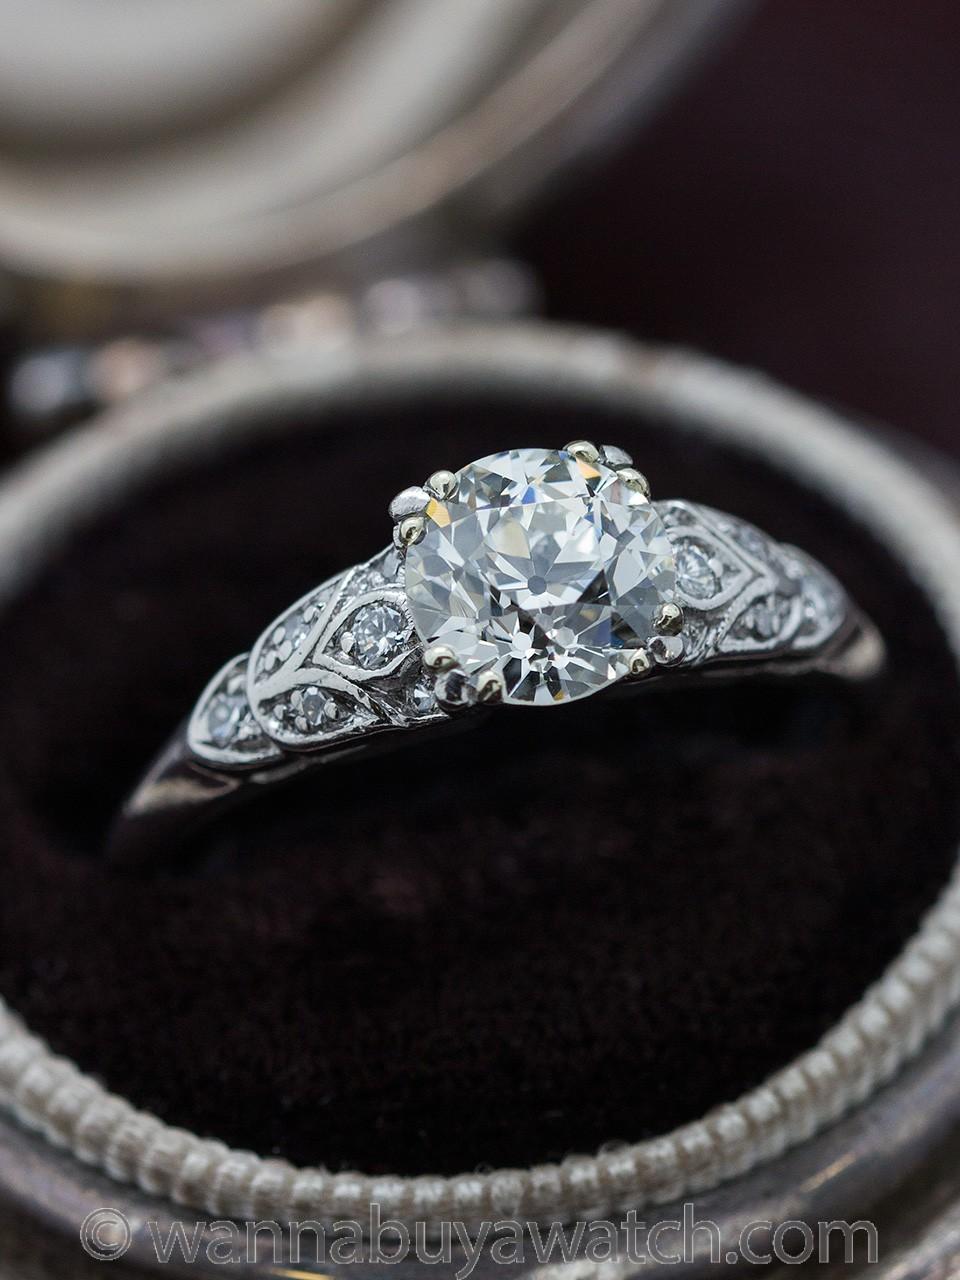 Vintage Engagement Ring Platinum 1.22ct Old European Cut I-VS2 circa 1930s